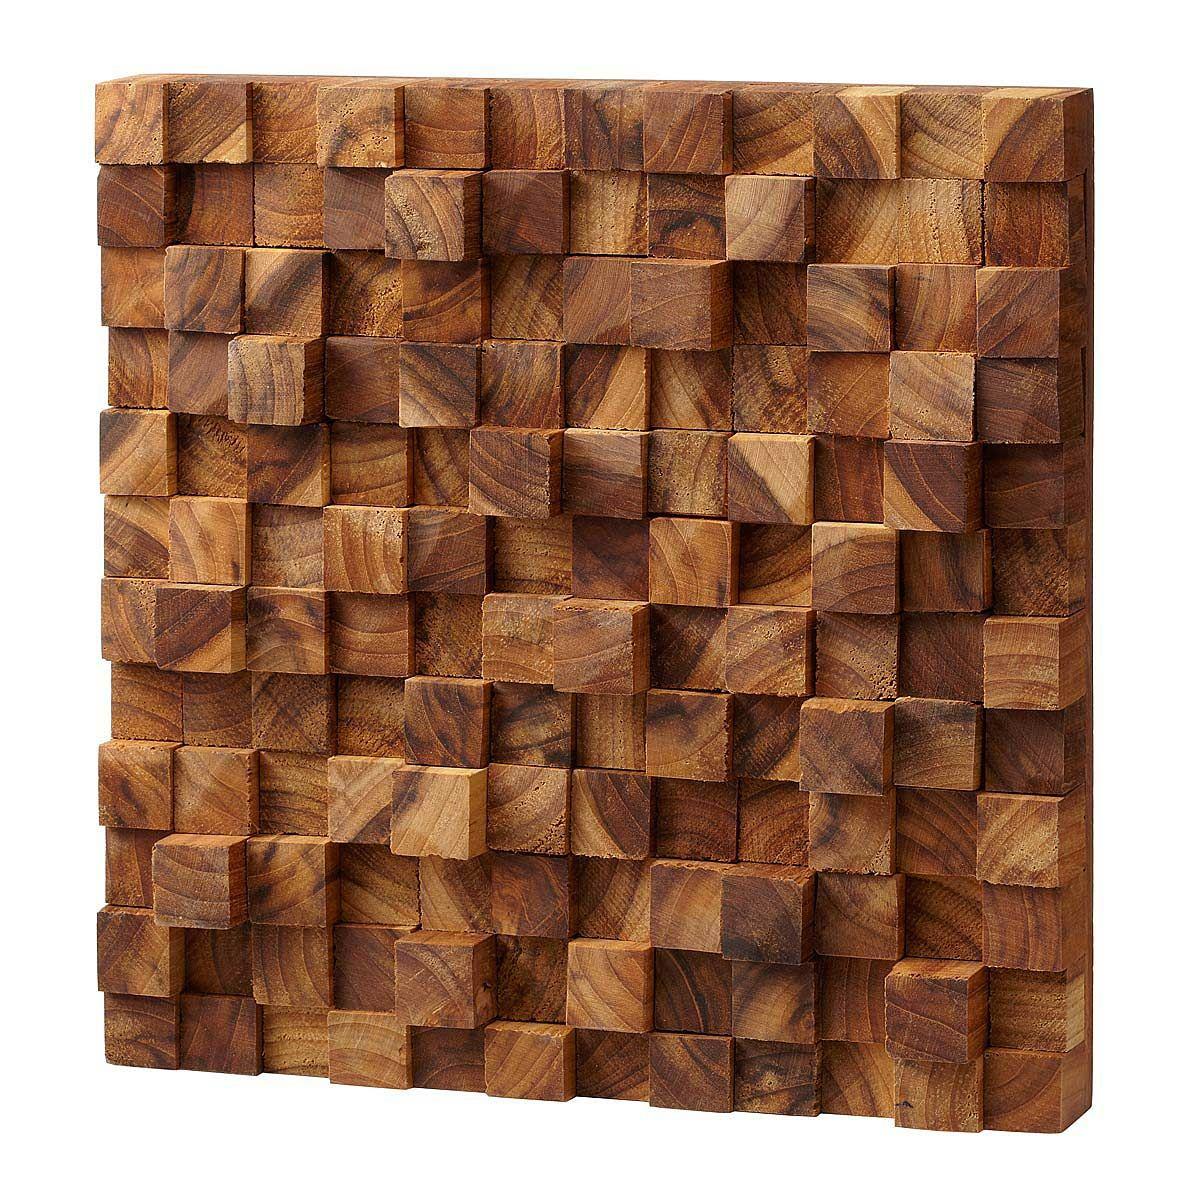 Wood Wall Art Square Takara Wall Art  Shelves Teak Wood And Walls